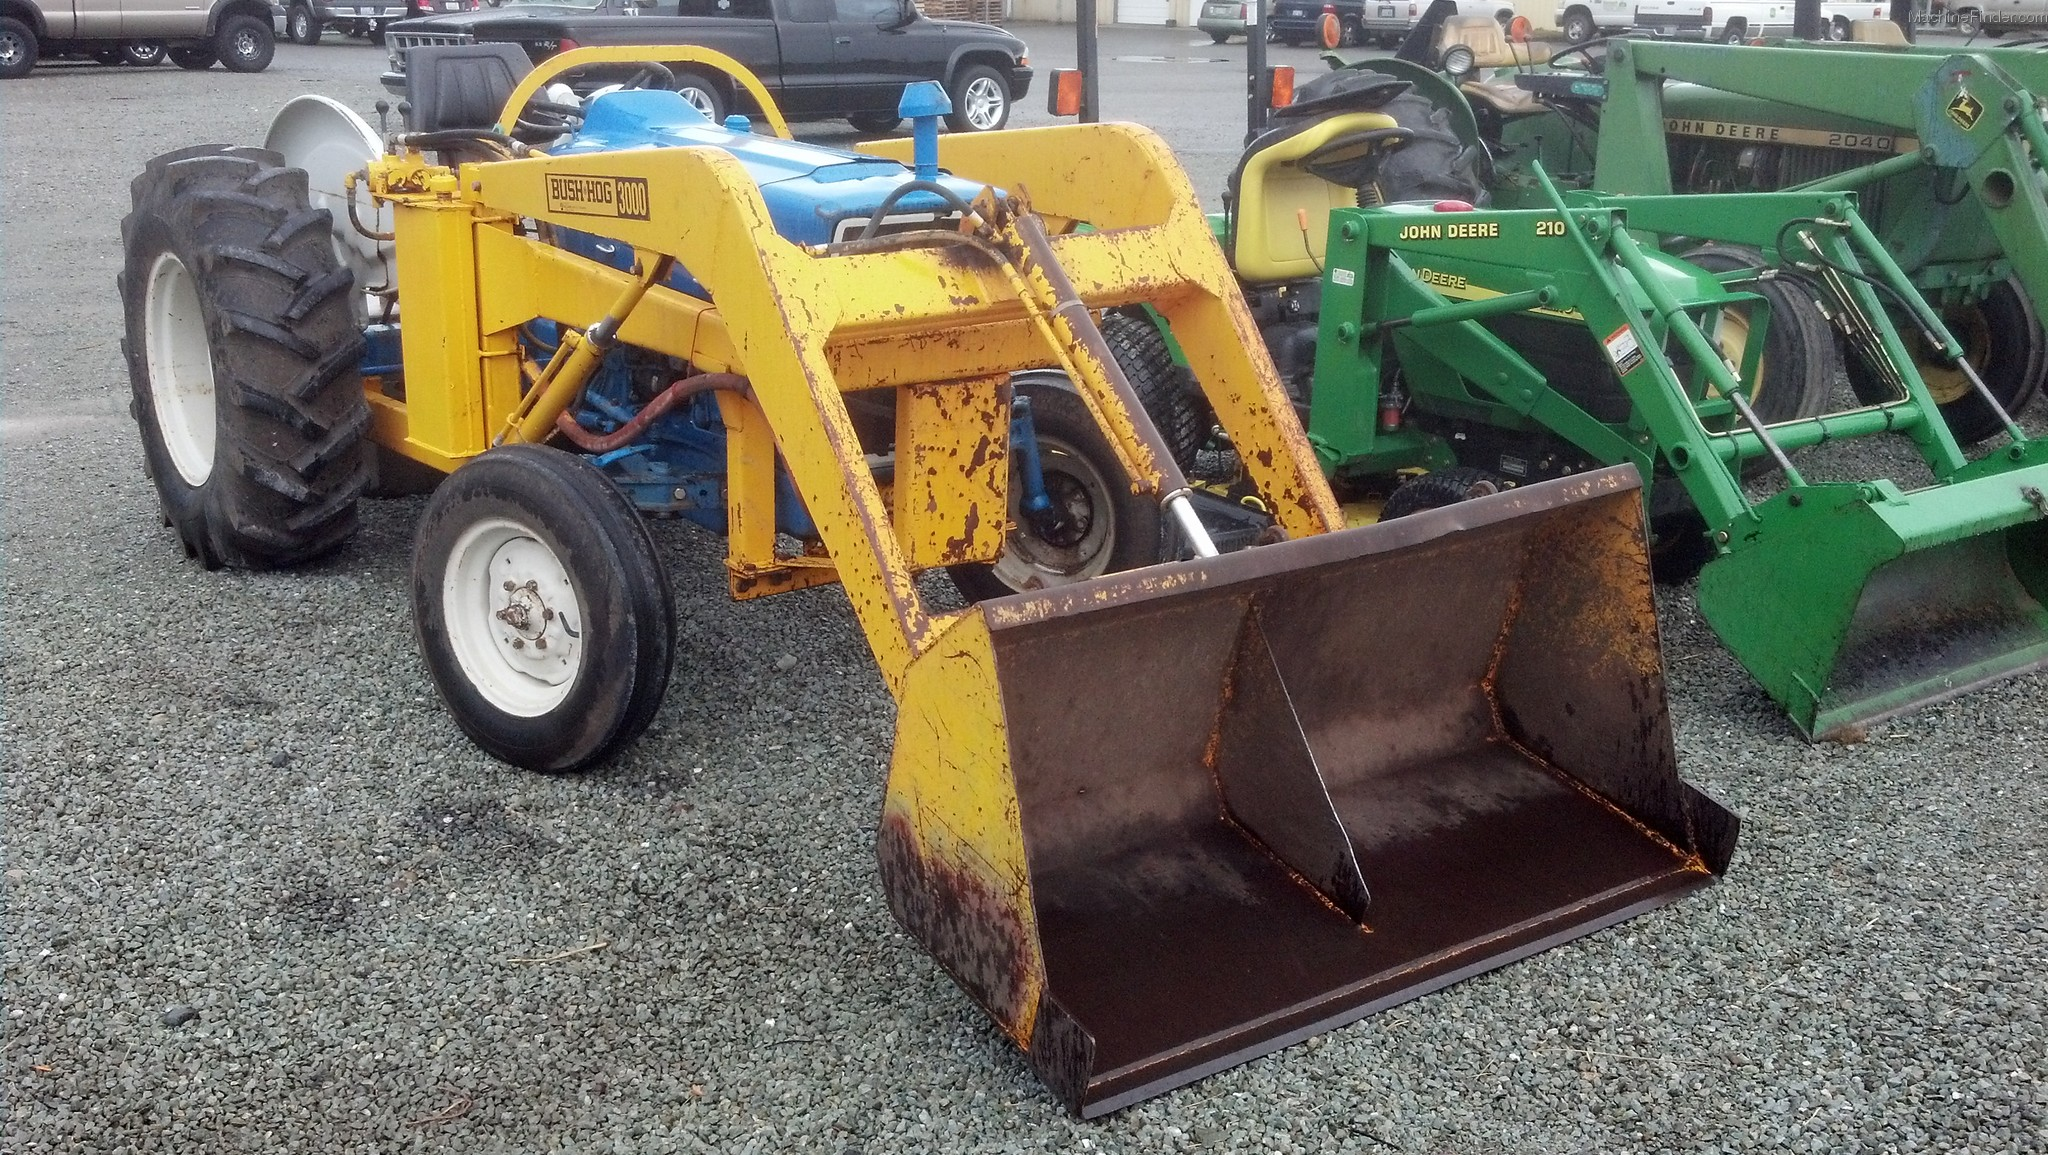 1972 Ford 3000 Tractor Parts : Machinefinder my news faq help financing